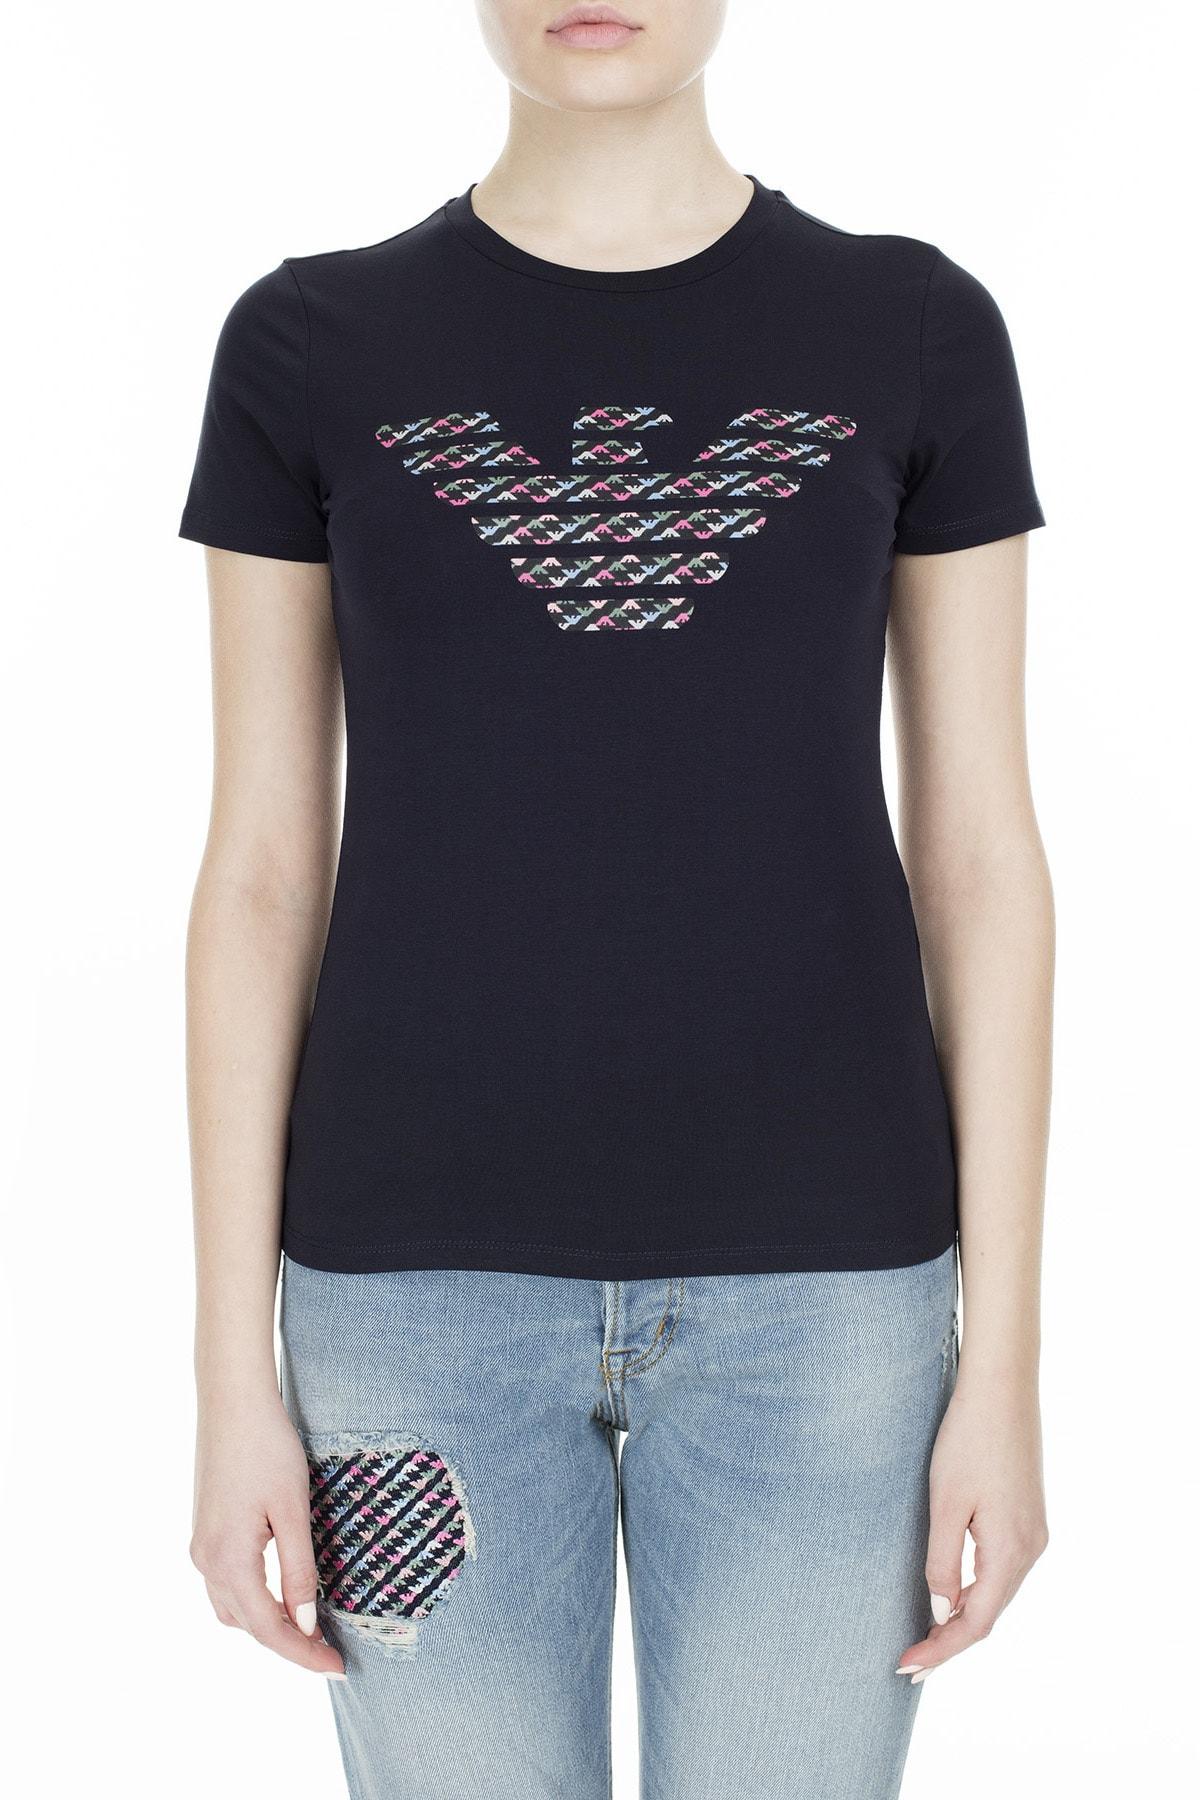 Emporio Armani T Shirt Kadın T Shirt S 6G2T7N 2J07Z 0927 S 6G2T7N 2J07Z 0927